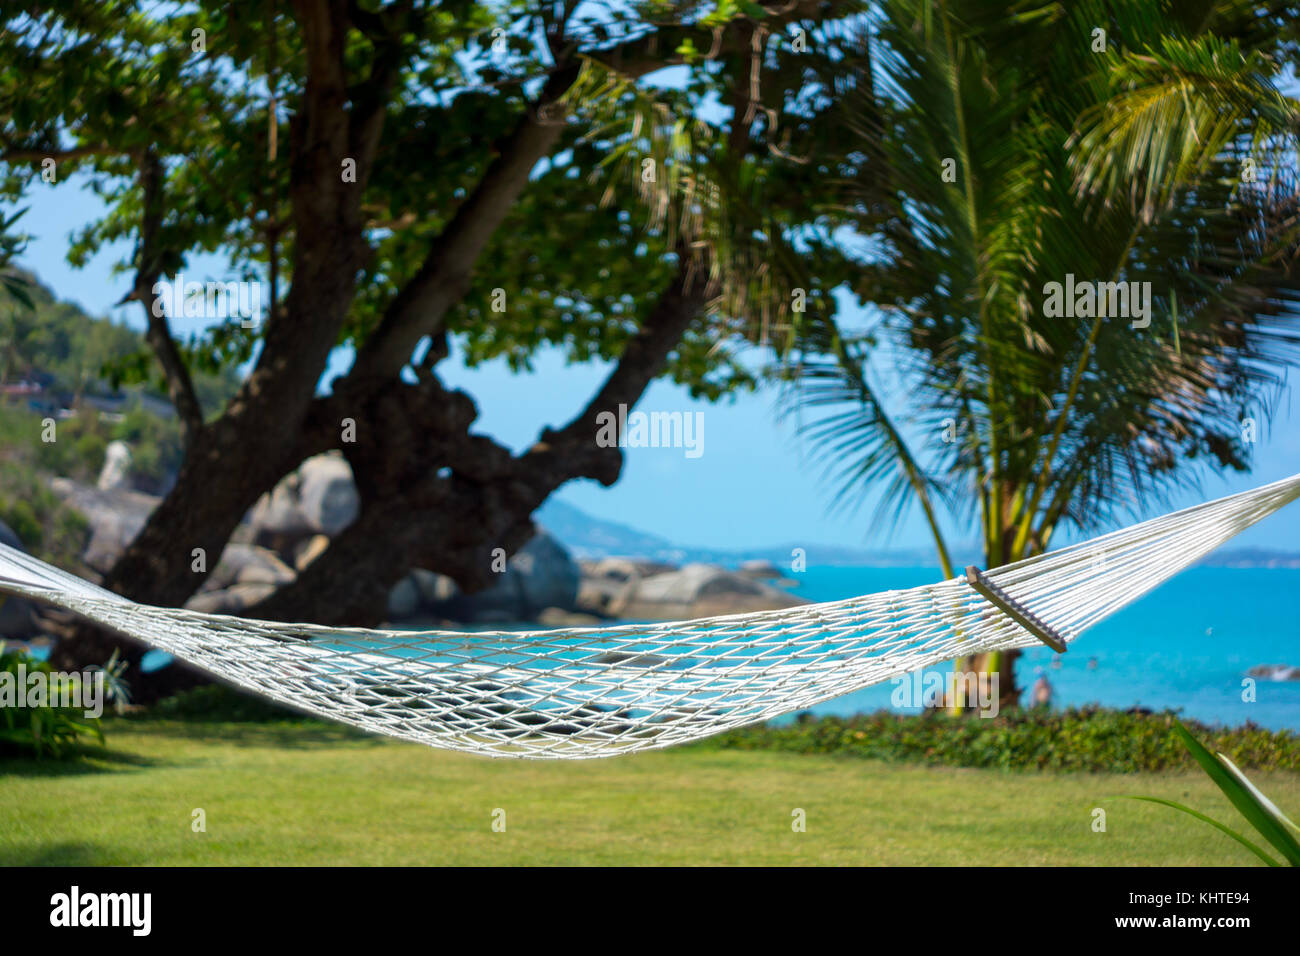 Island Palm Tree Hammock Resort Stock Photos Amp Island Palm